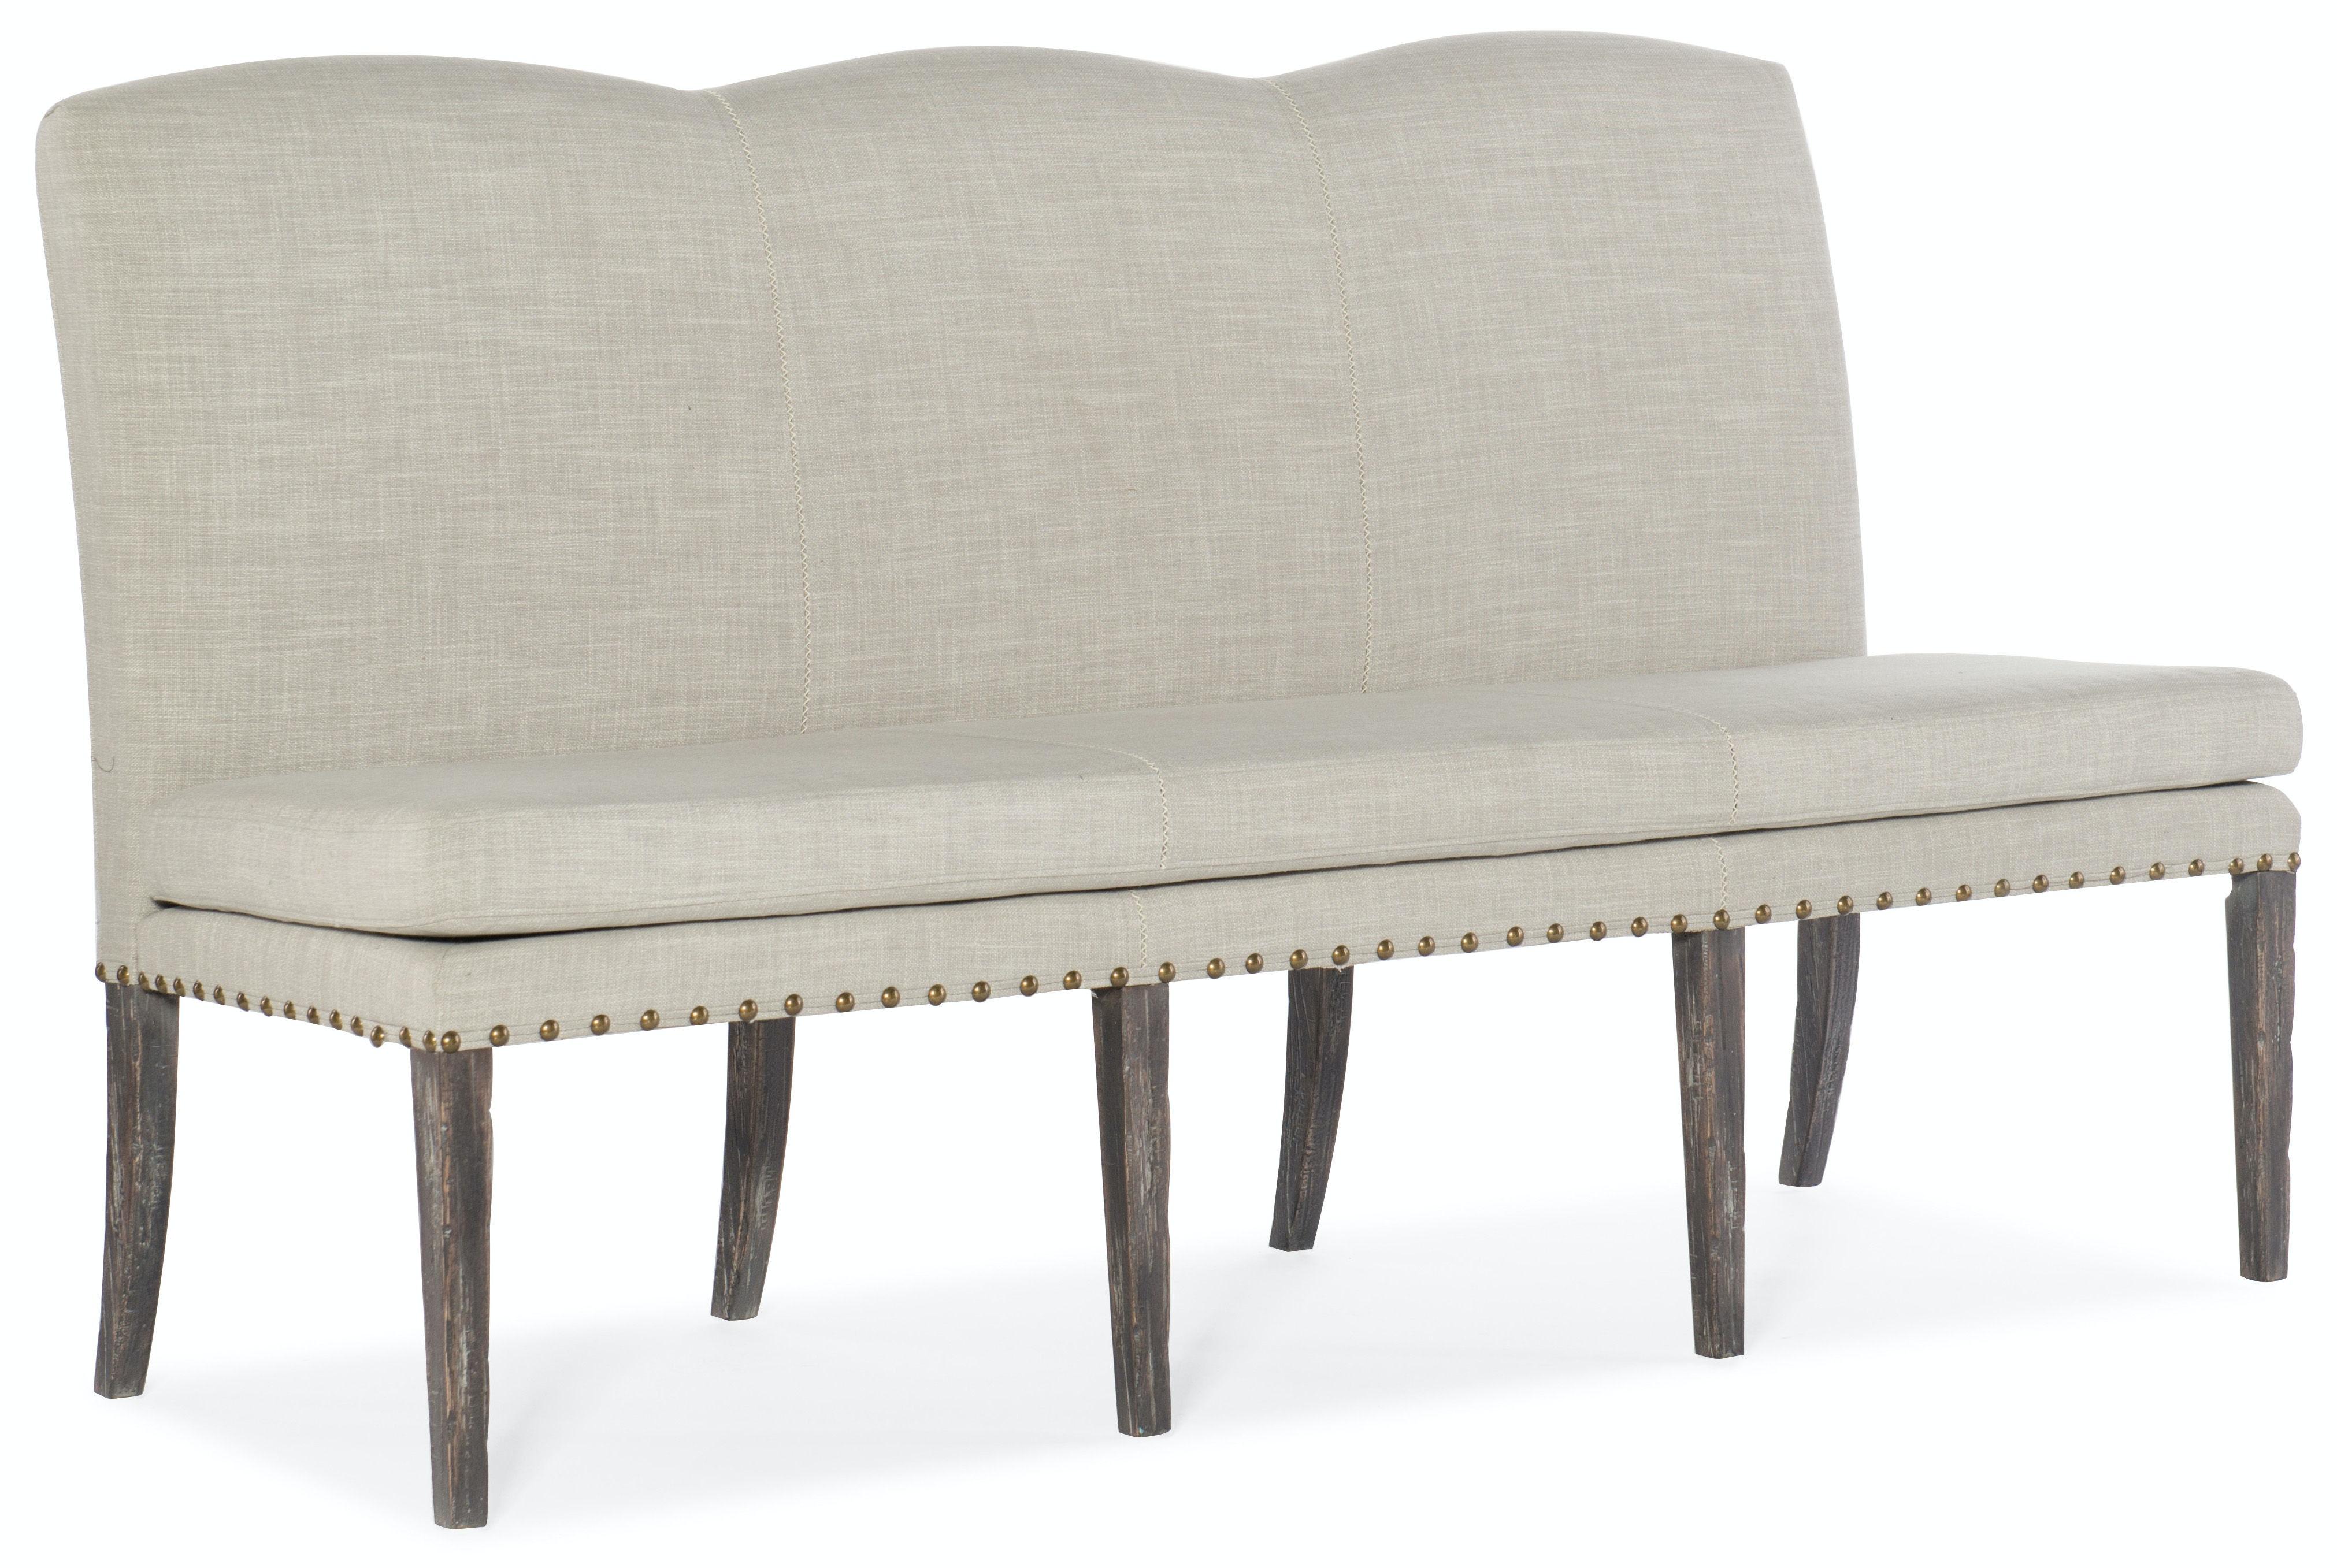 Hooker Furniture Beaumont Upholstered Dining Bench 5751 75315 95